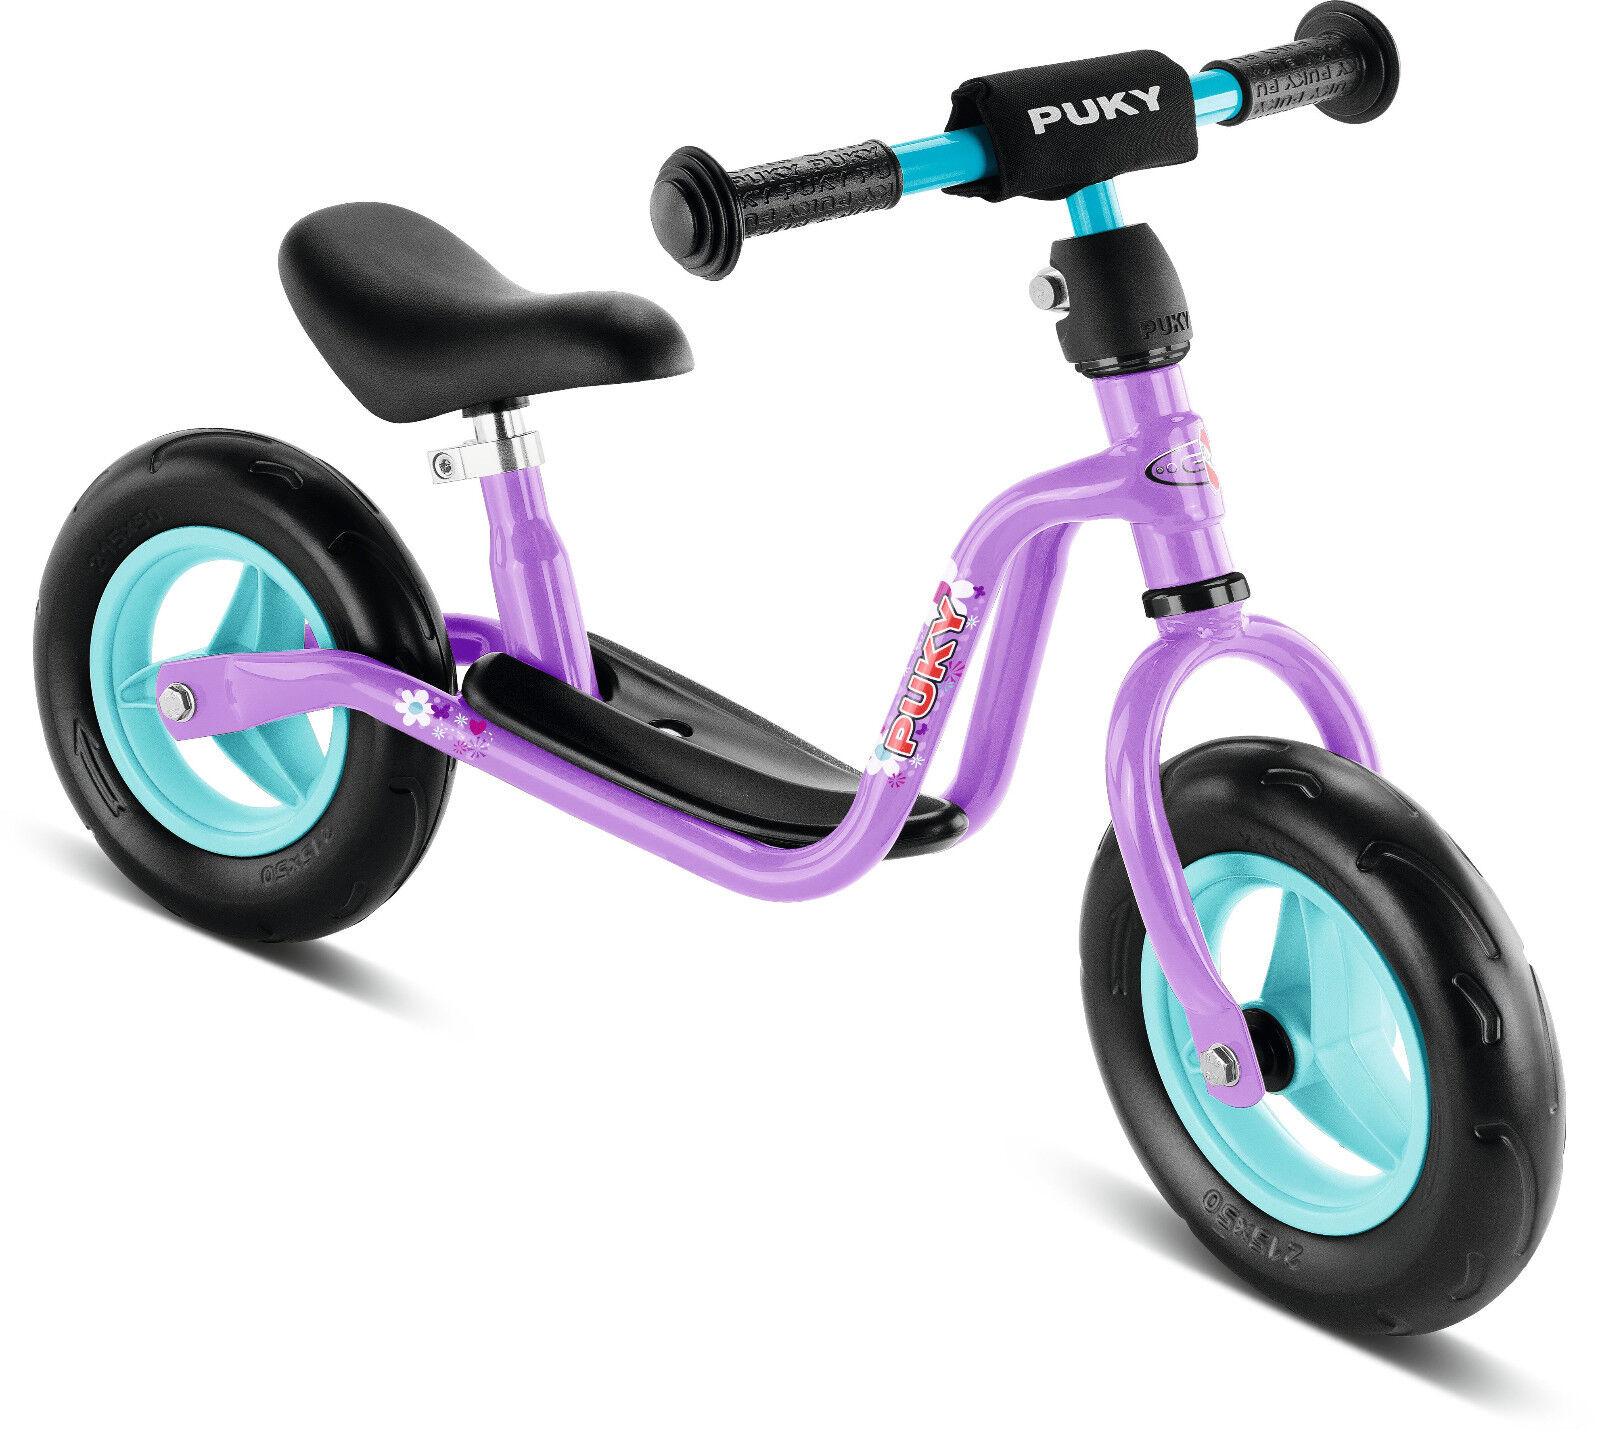 Laufrad Puky 4059 LR M Lila Kinderlaufrad Kinderlaufrad Kinderlaufrad Lauflernrad Lernrad Kinderlernlaufrad 6cc8c8